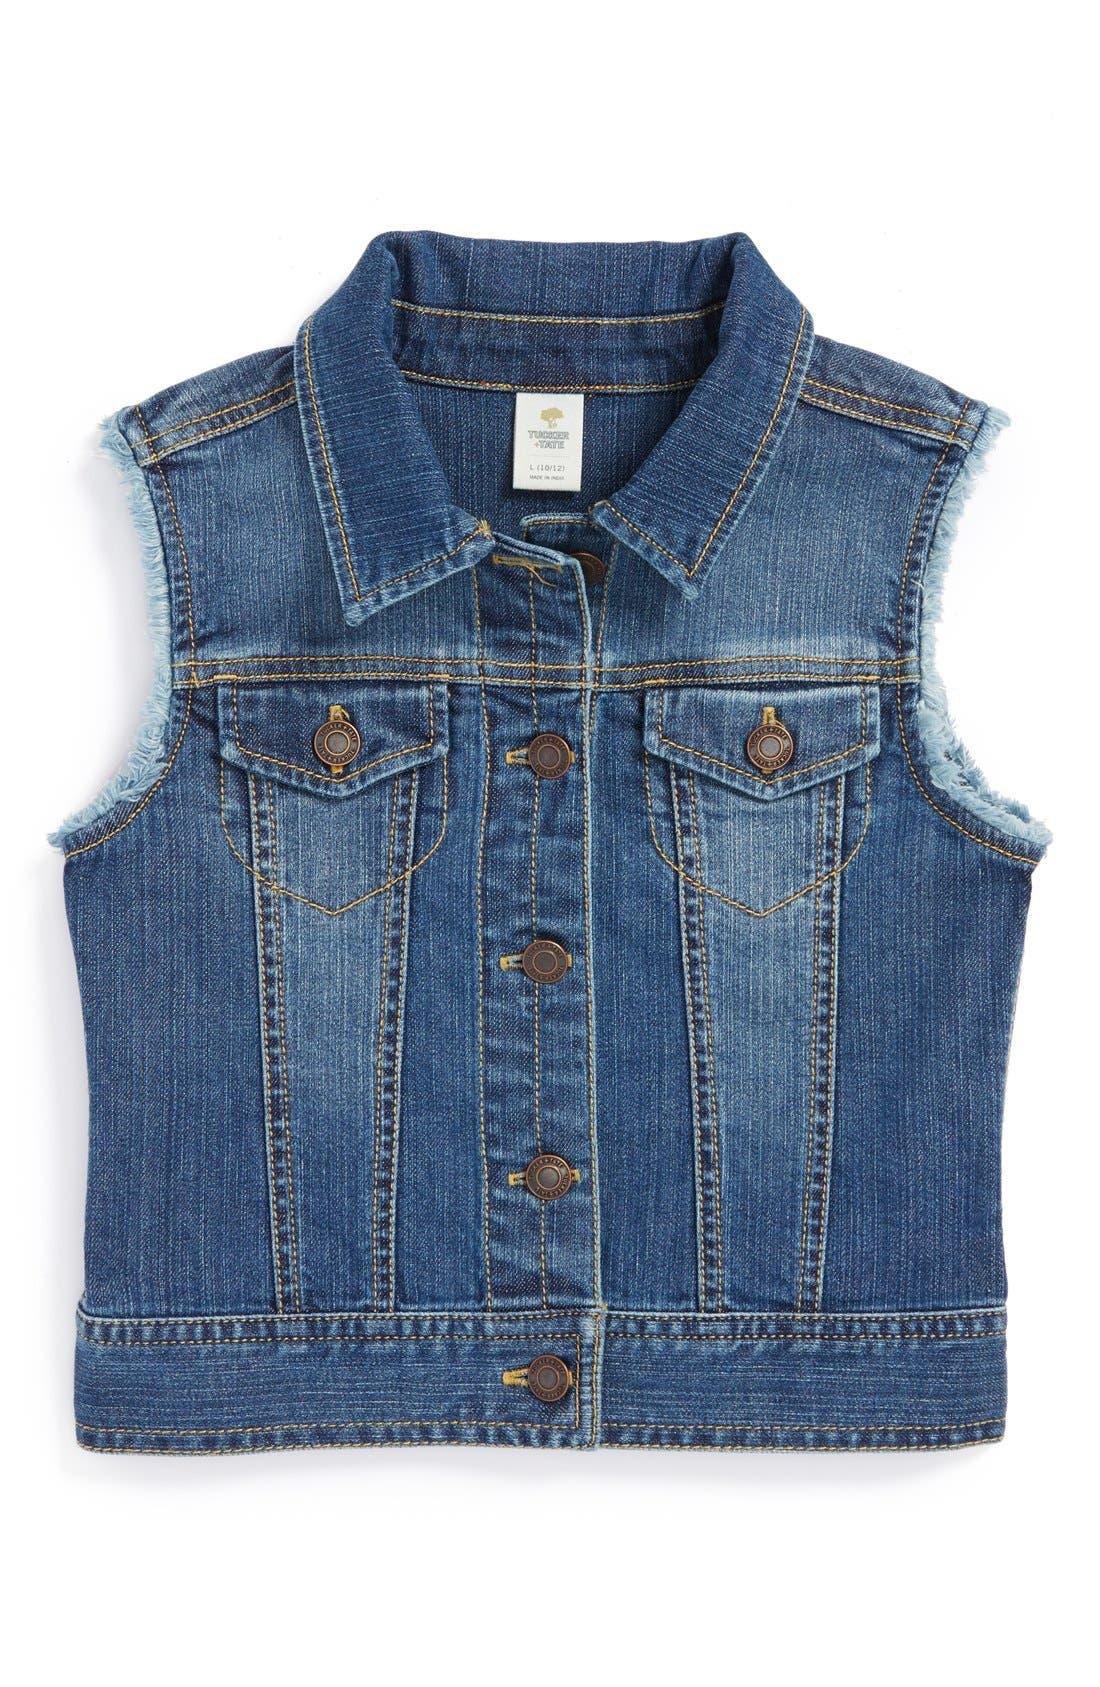 Alternate Image 1 Selected - Tucker + Tate Denim Vest (Big Girls)